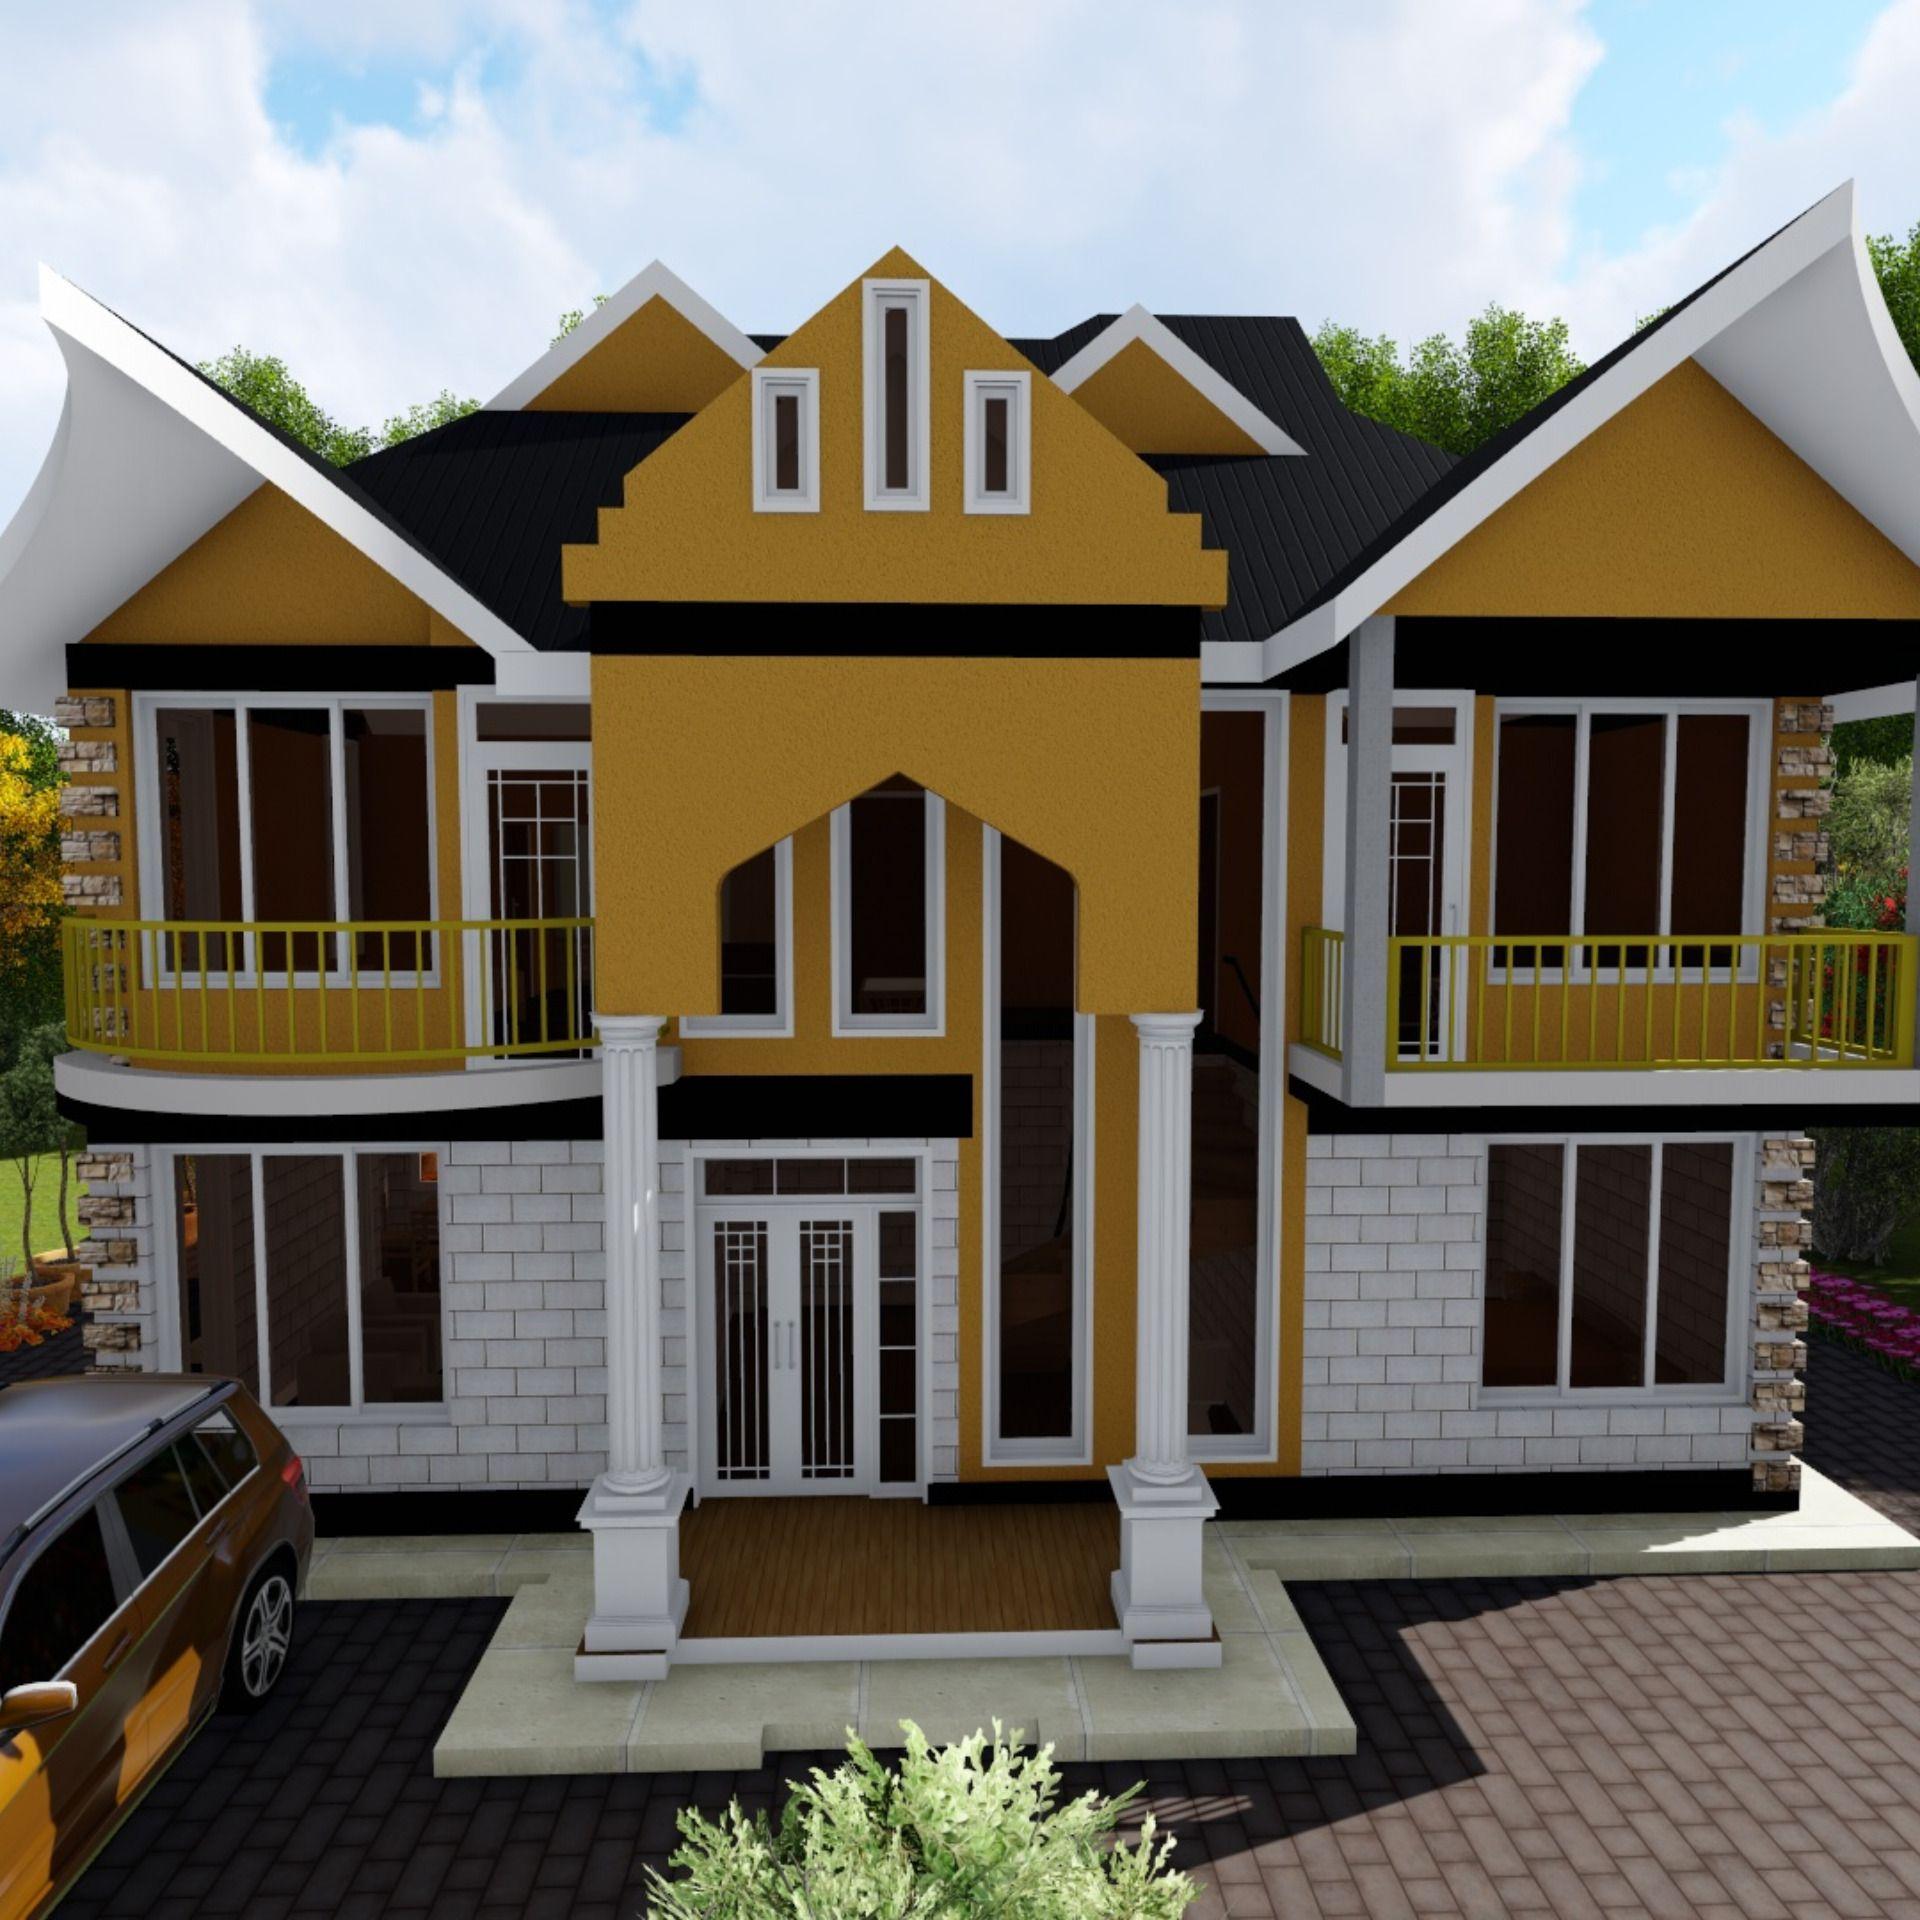 4 Bedroom Roofed Home House Designs In Kenya 4 Bedroom House Designs House Plans